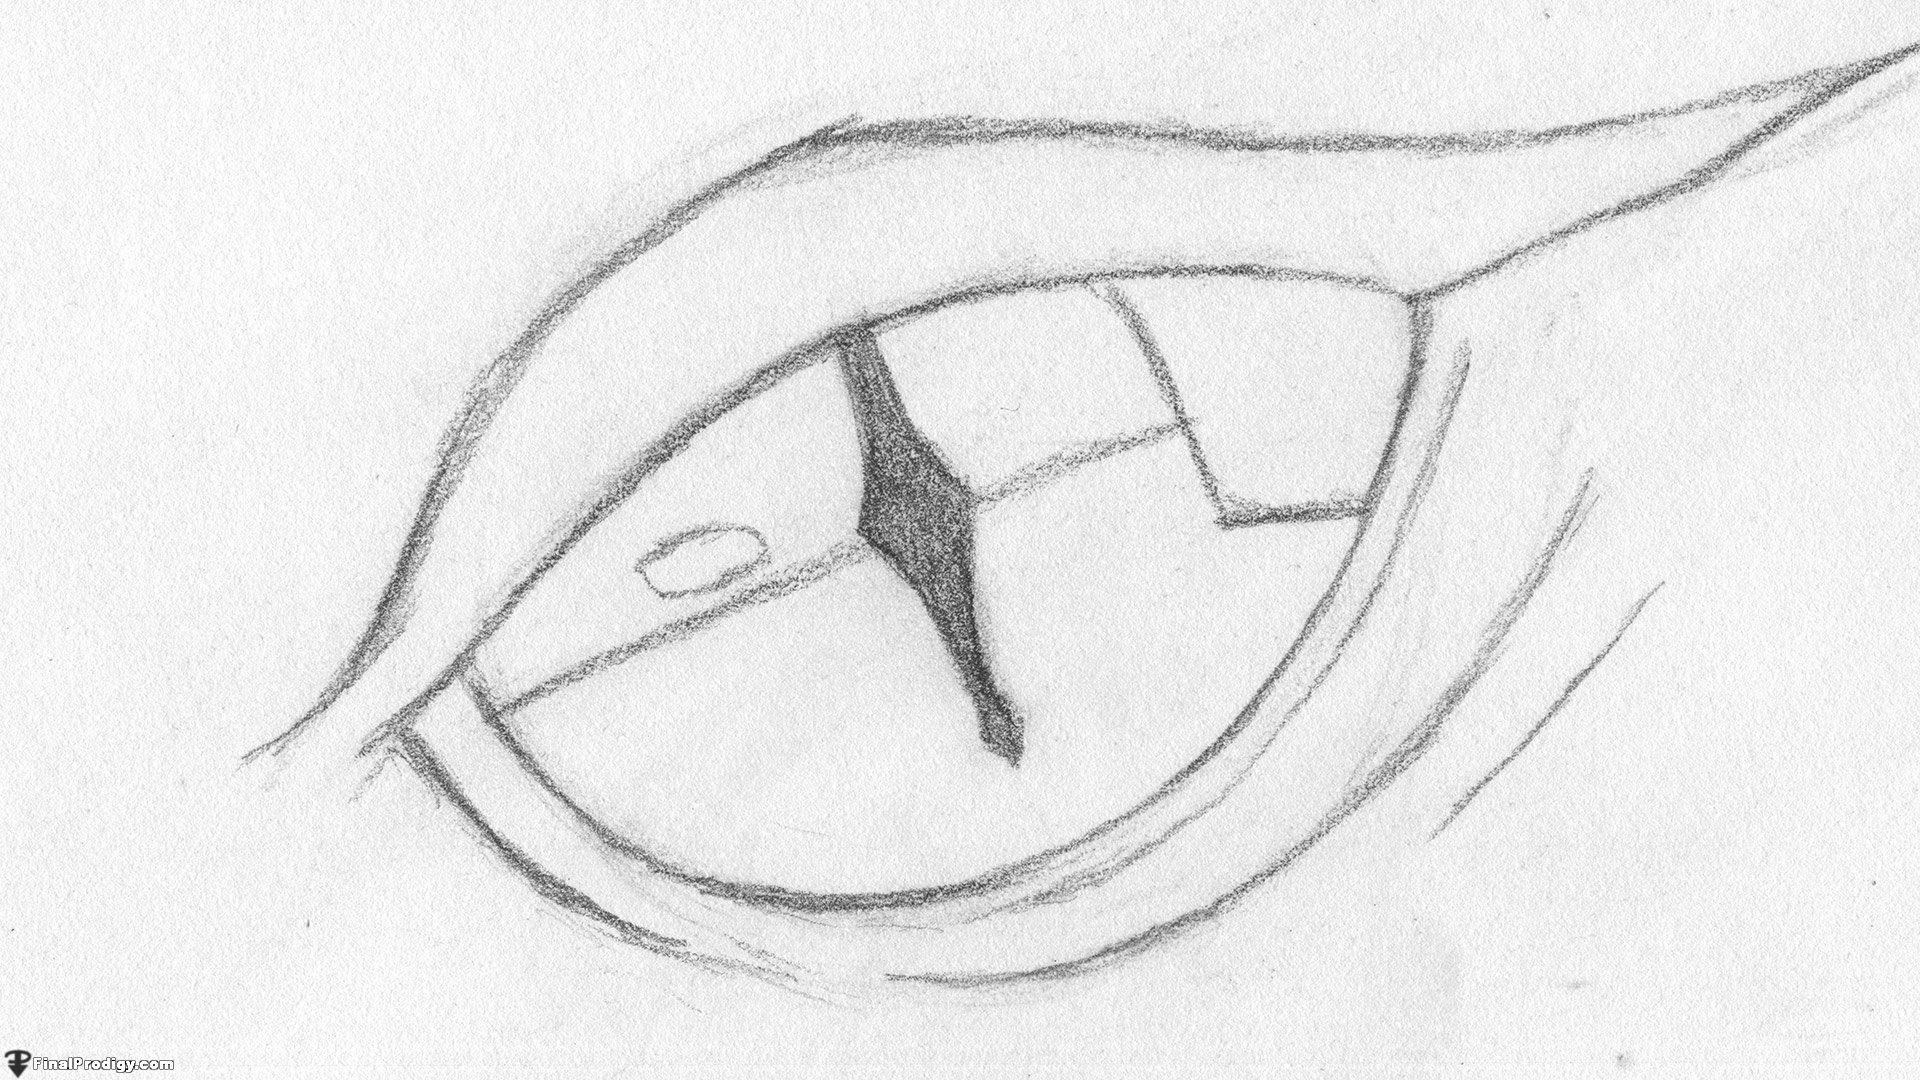 How To Draw A Dragon Eye Smaug S Eye Finalprodigy Com Things I